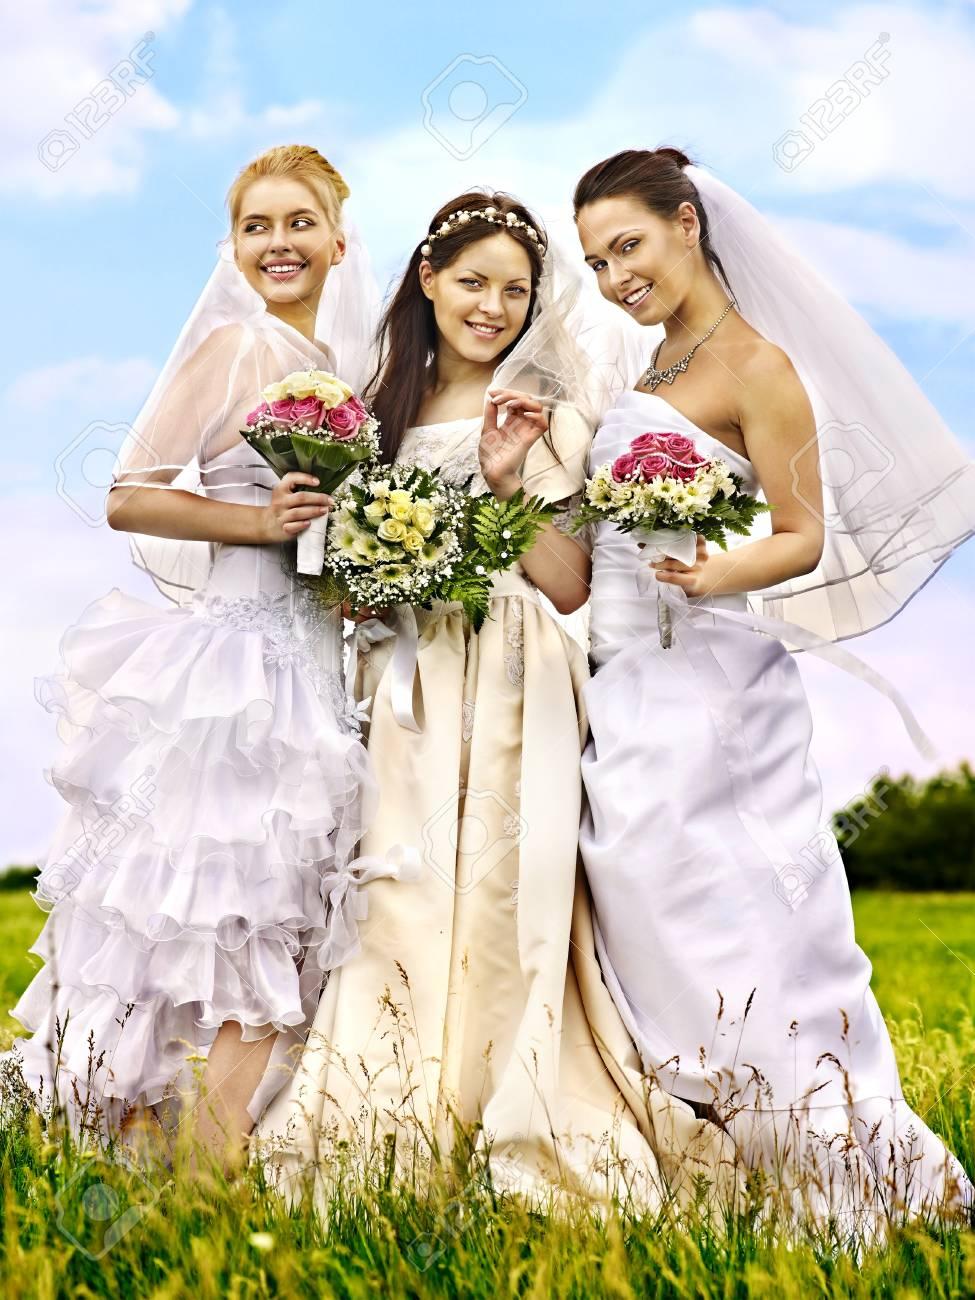 Happy group bride  wedding summer outdoor. Stock Photo - 20654251